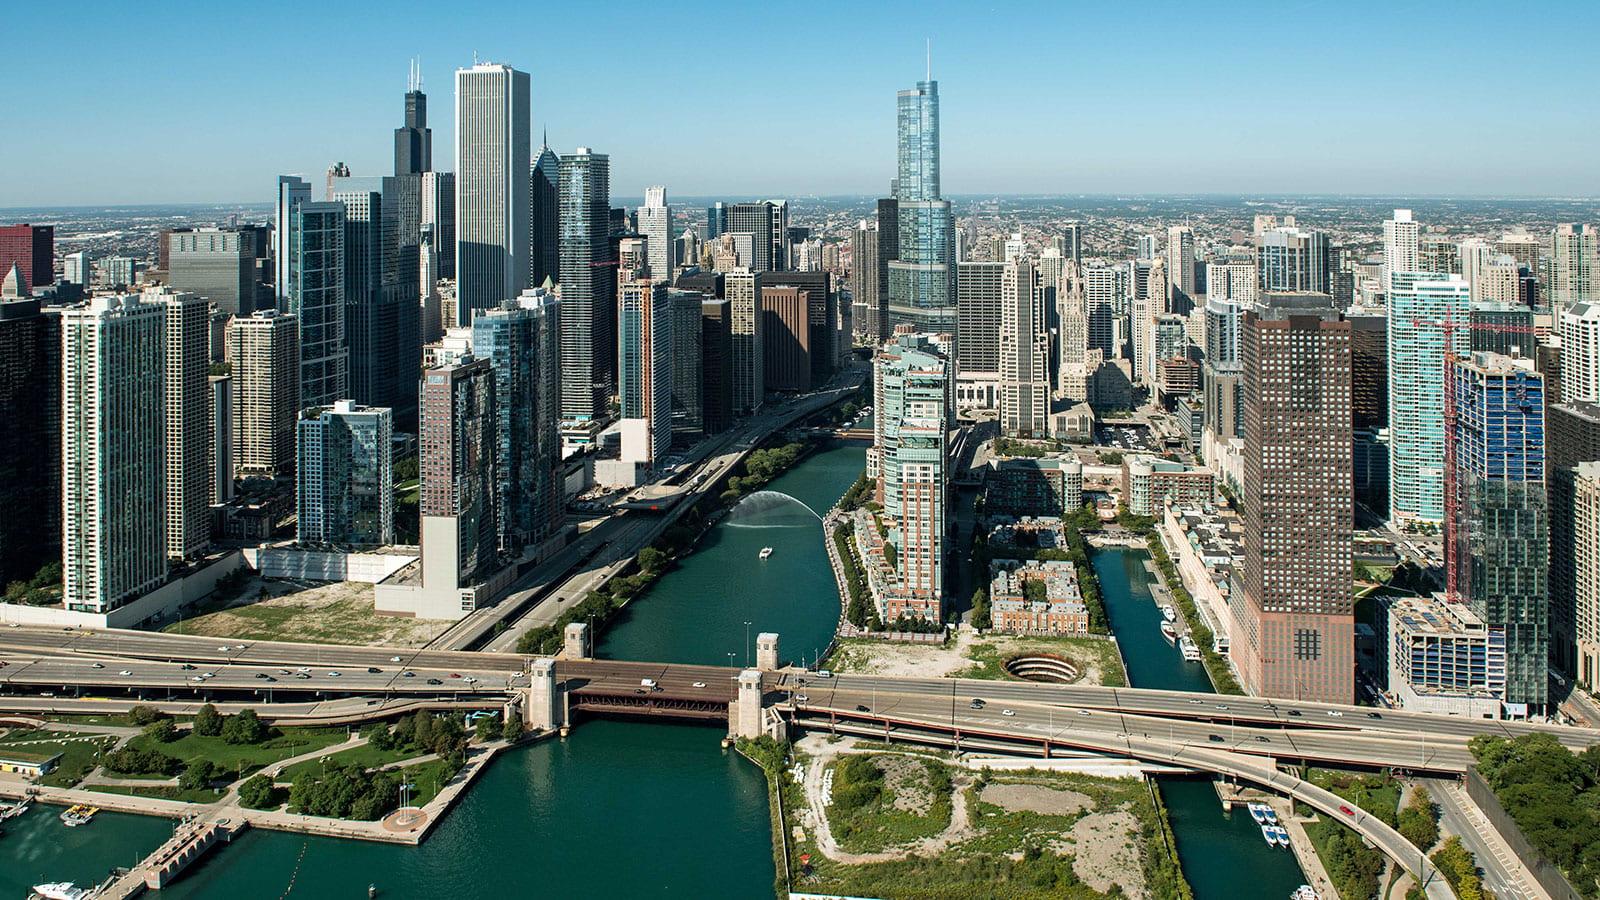 Photograph of Chicago skyline